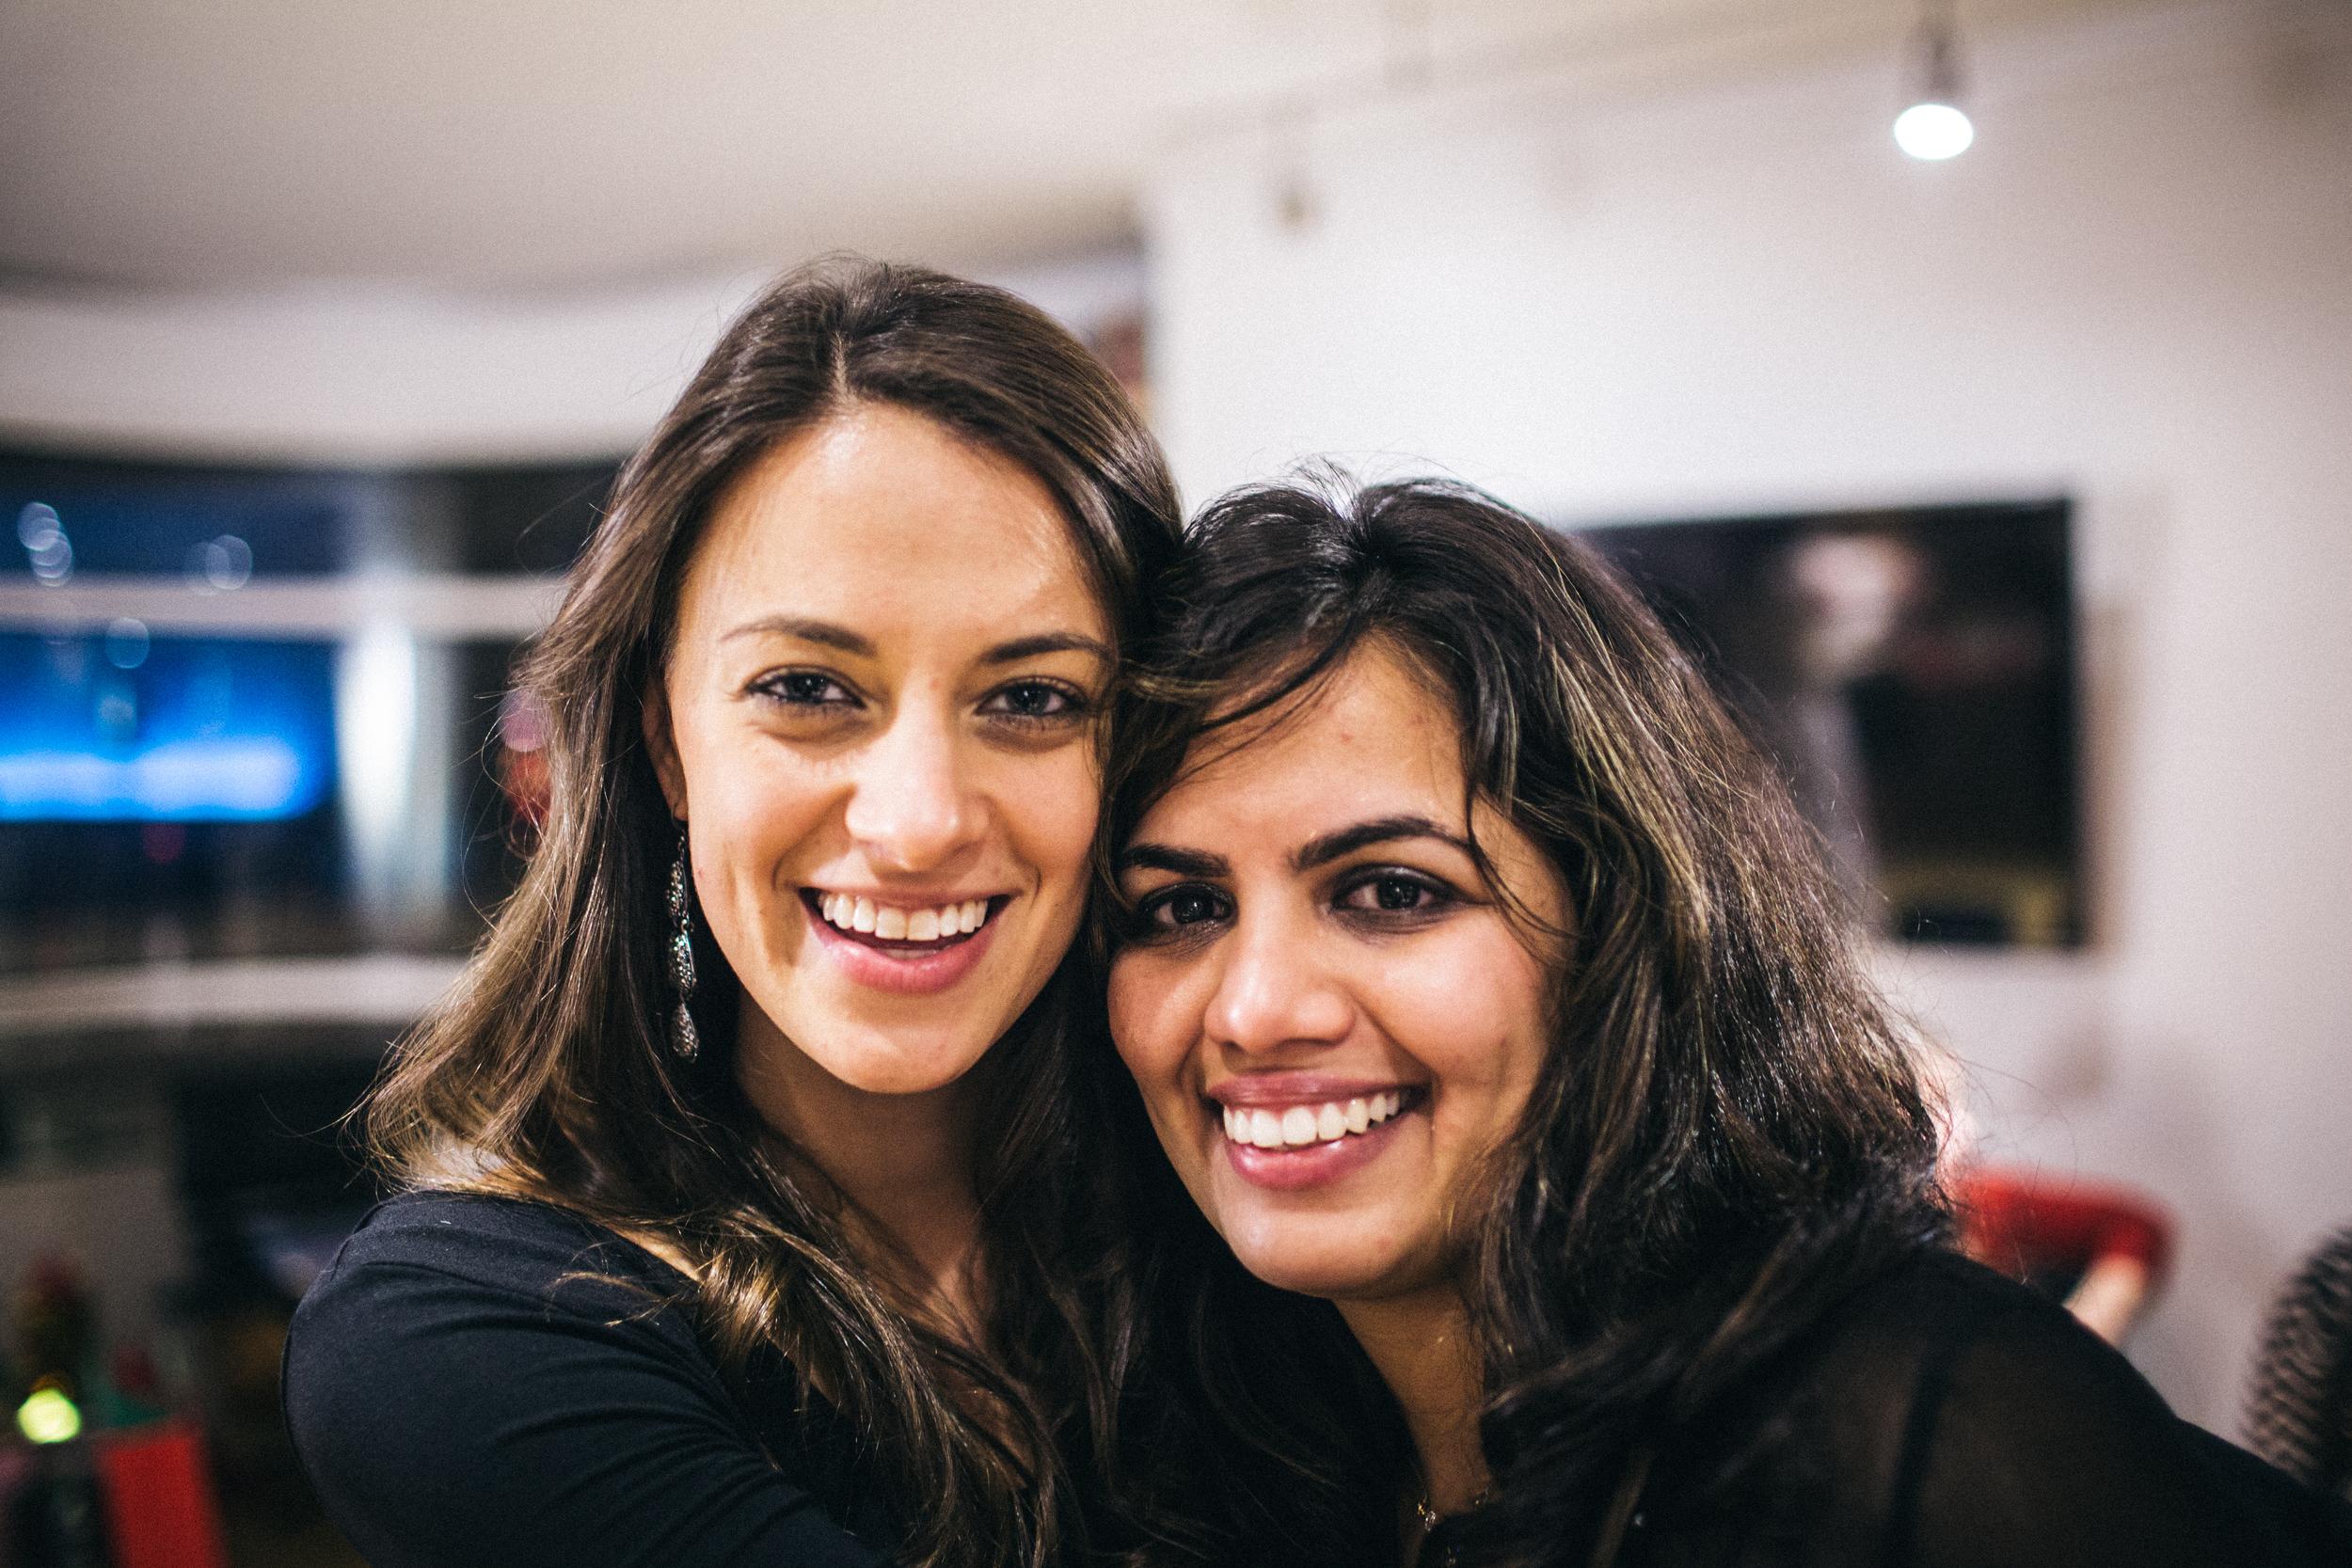 Alyse + Malika